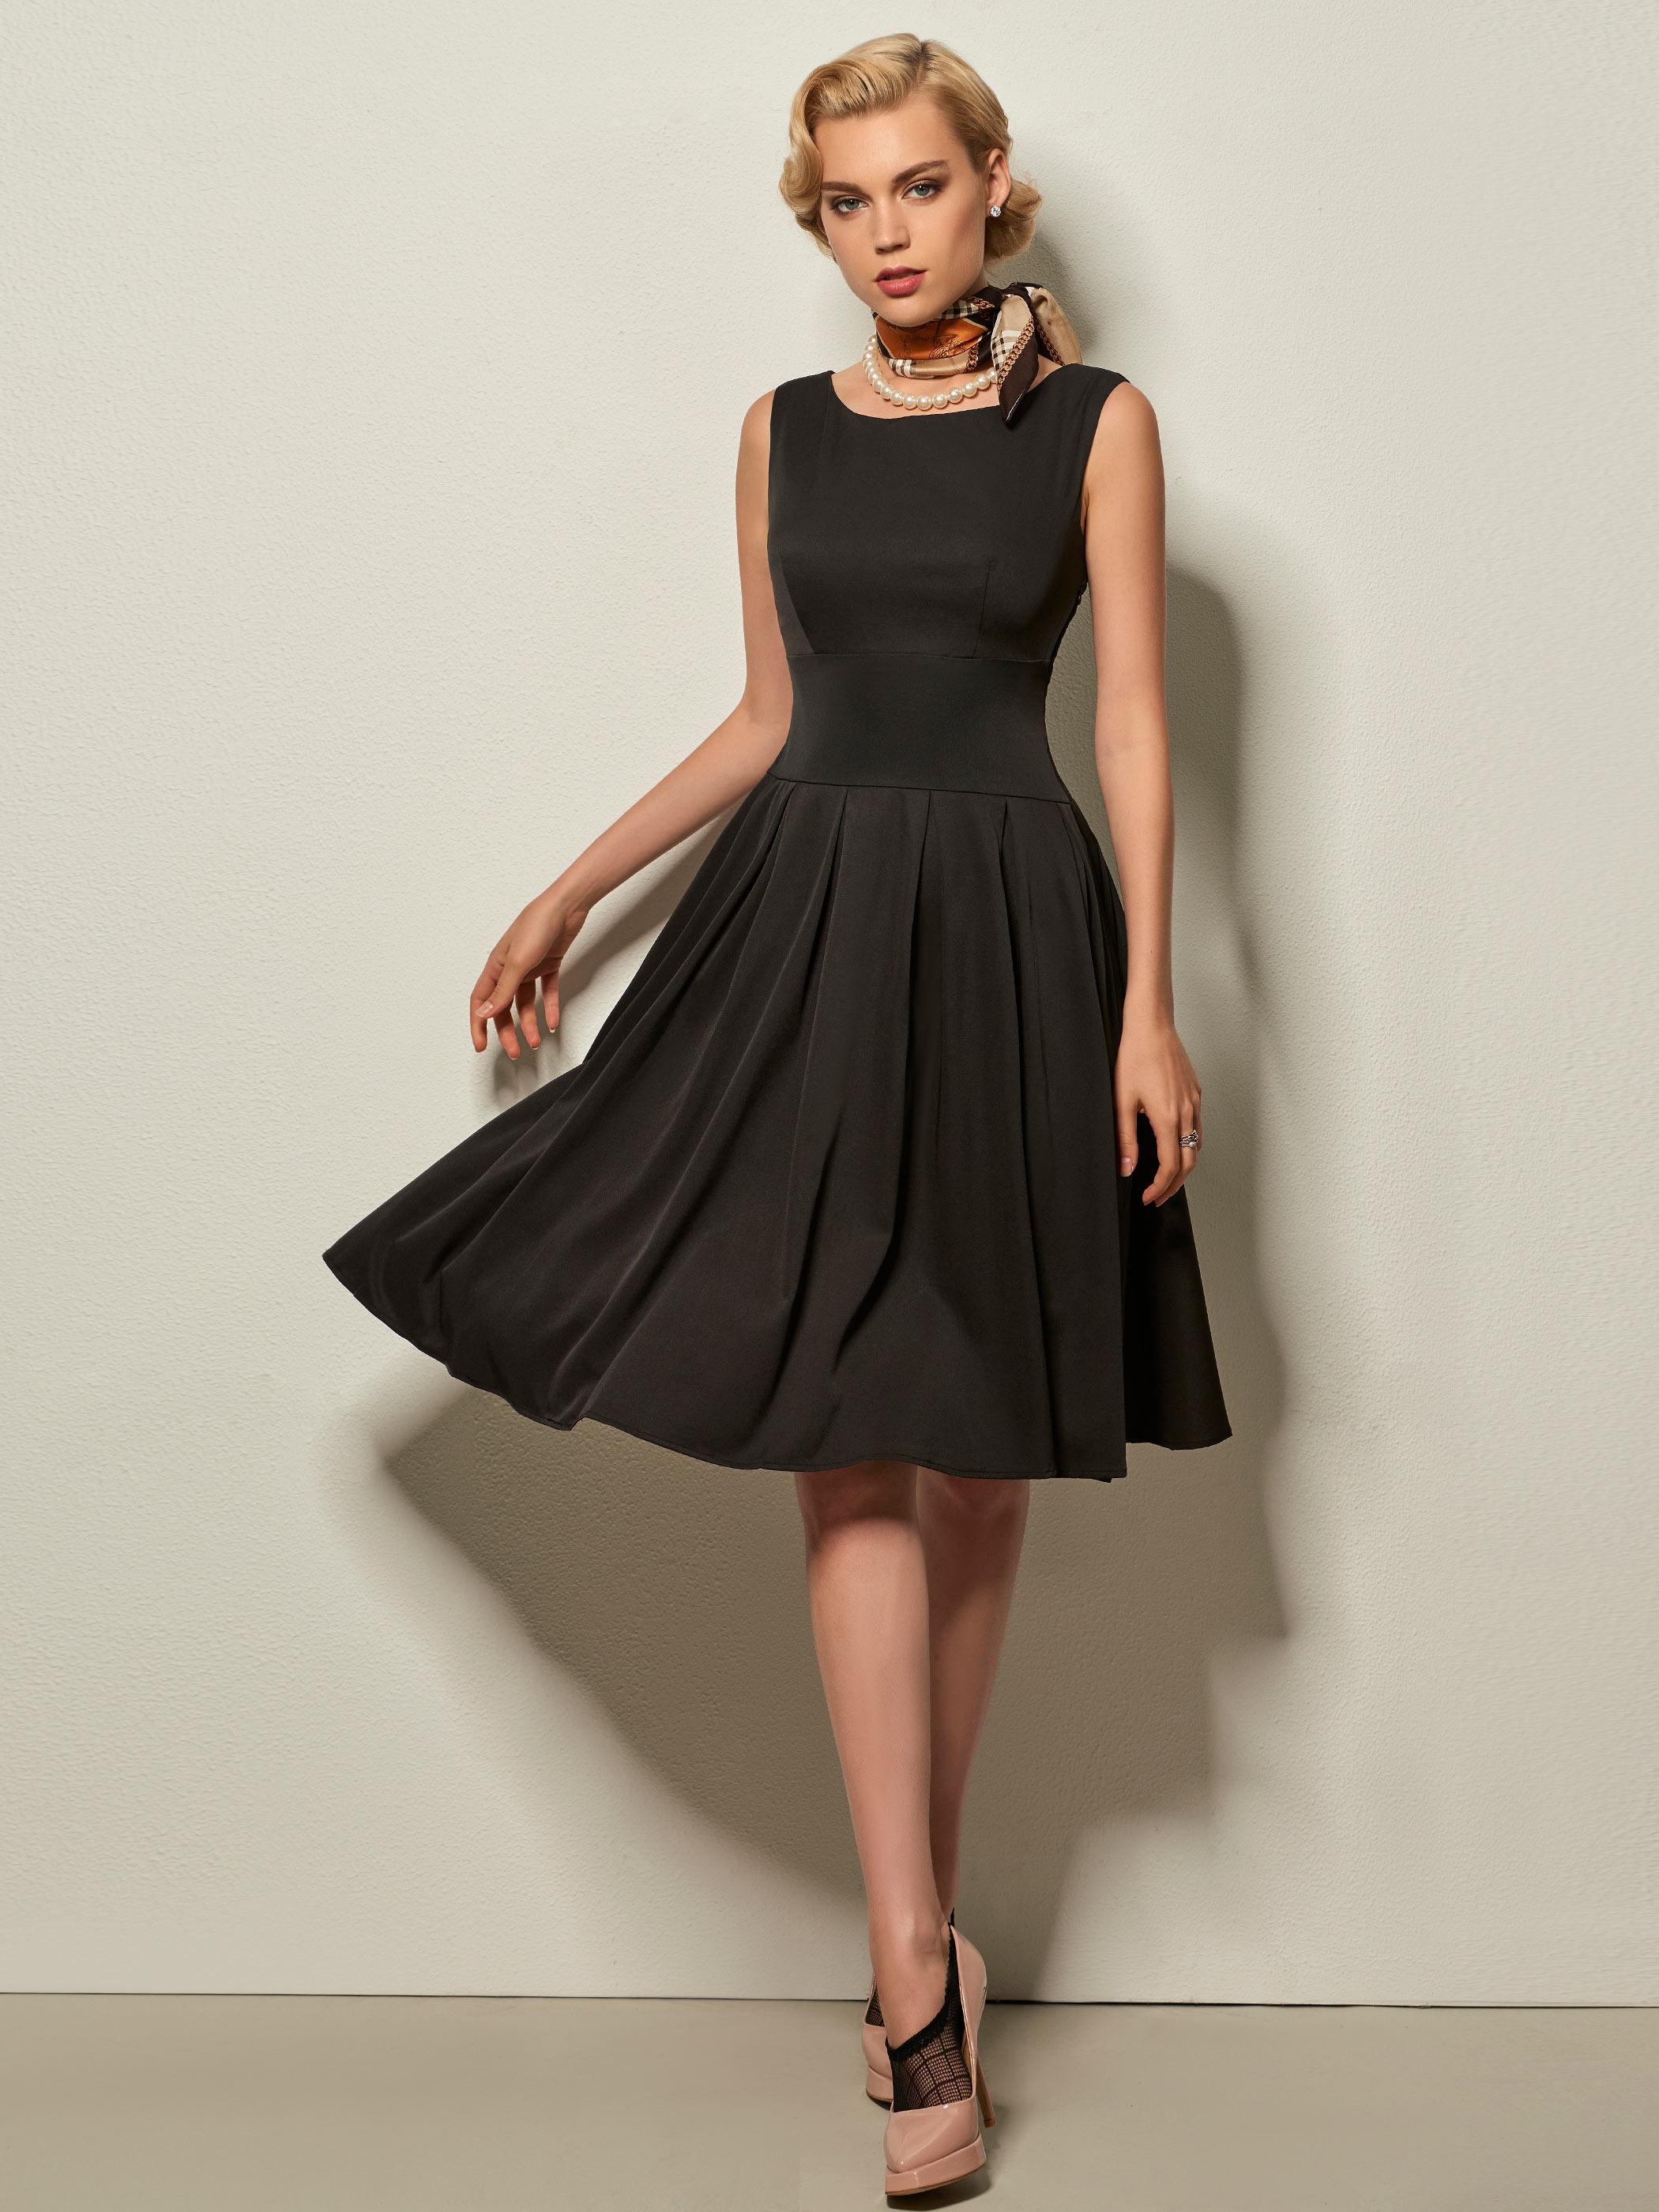 Aline Work Dresses